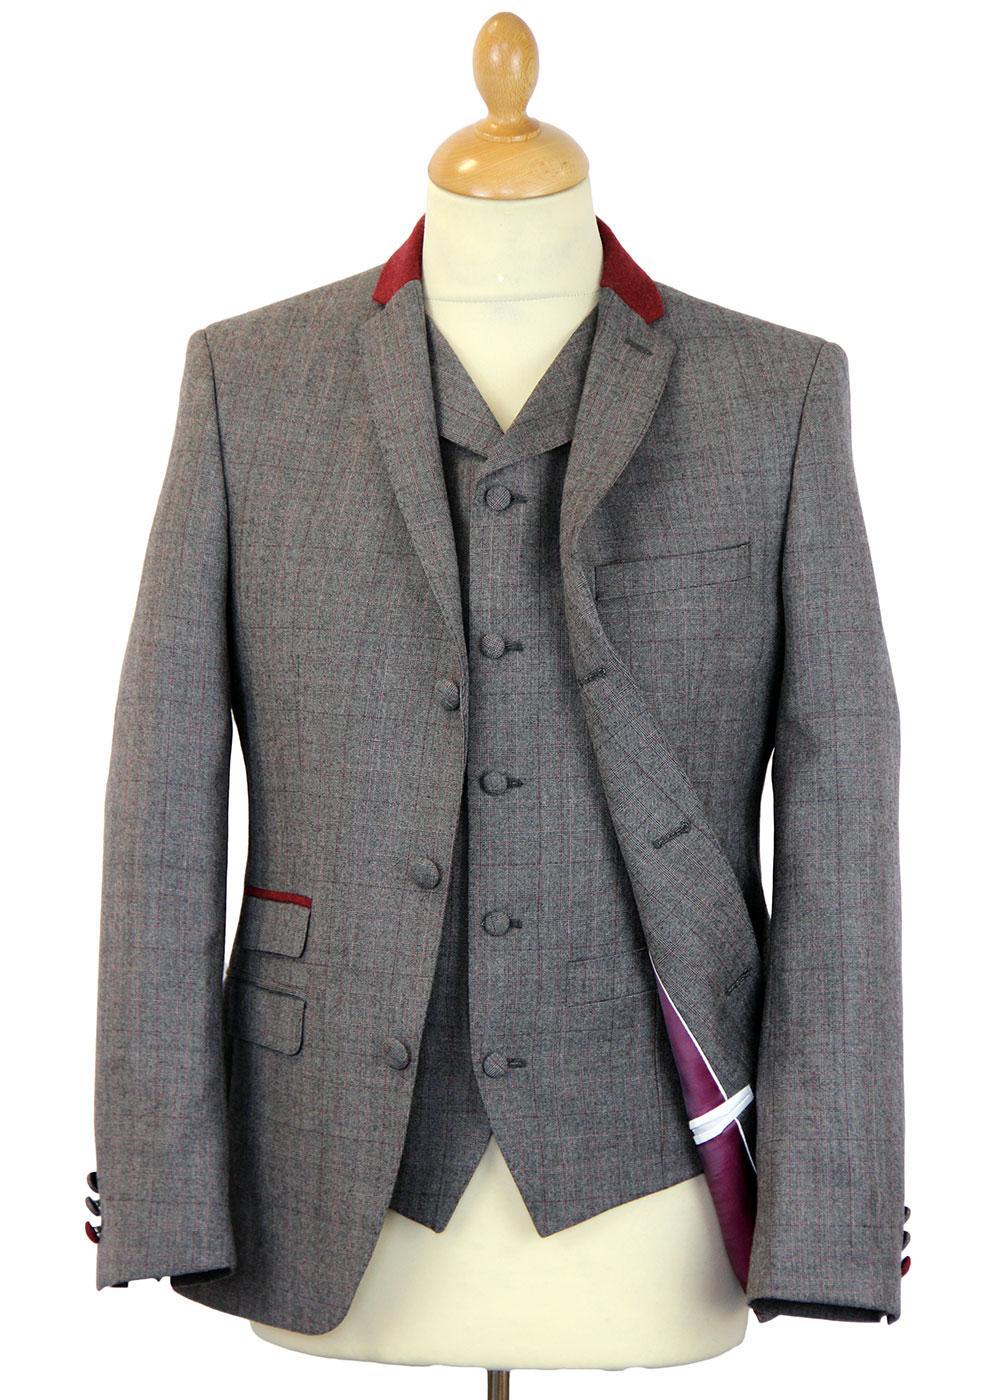 Redford MADCAP Retro 2 or 3 Piece Check Mod Suit